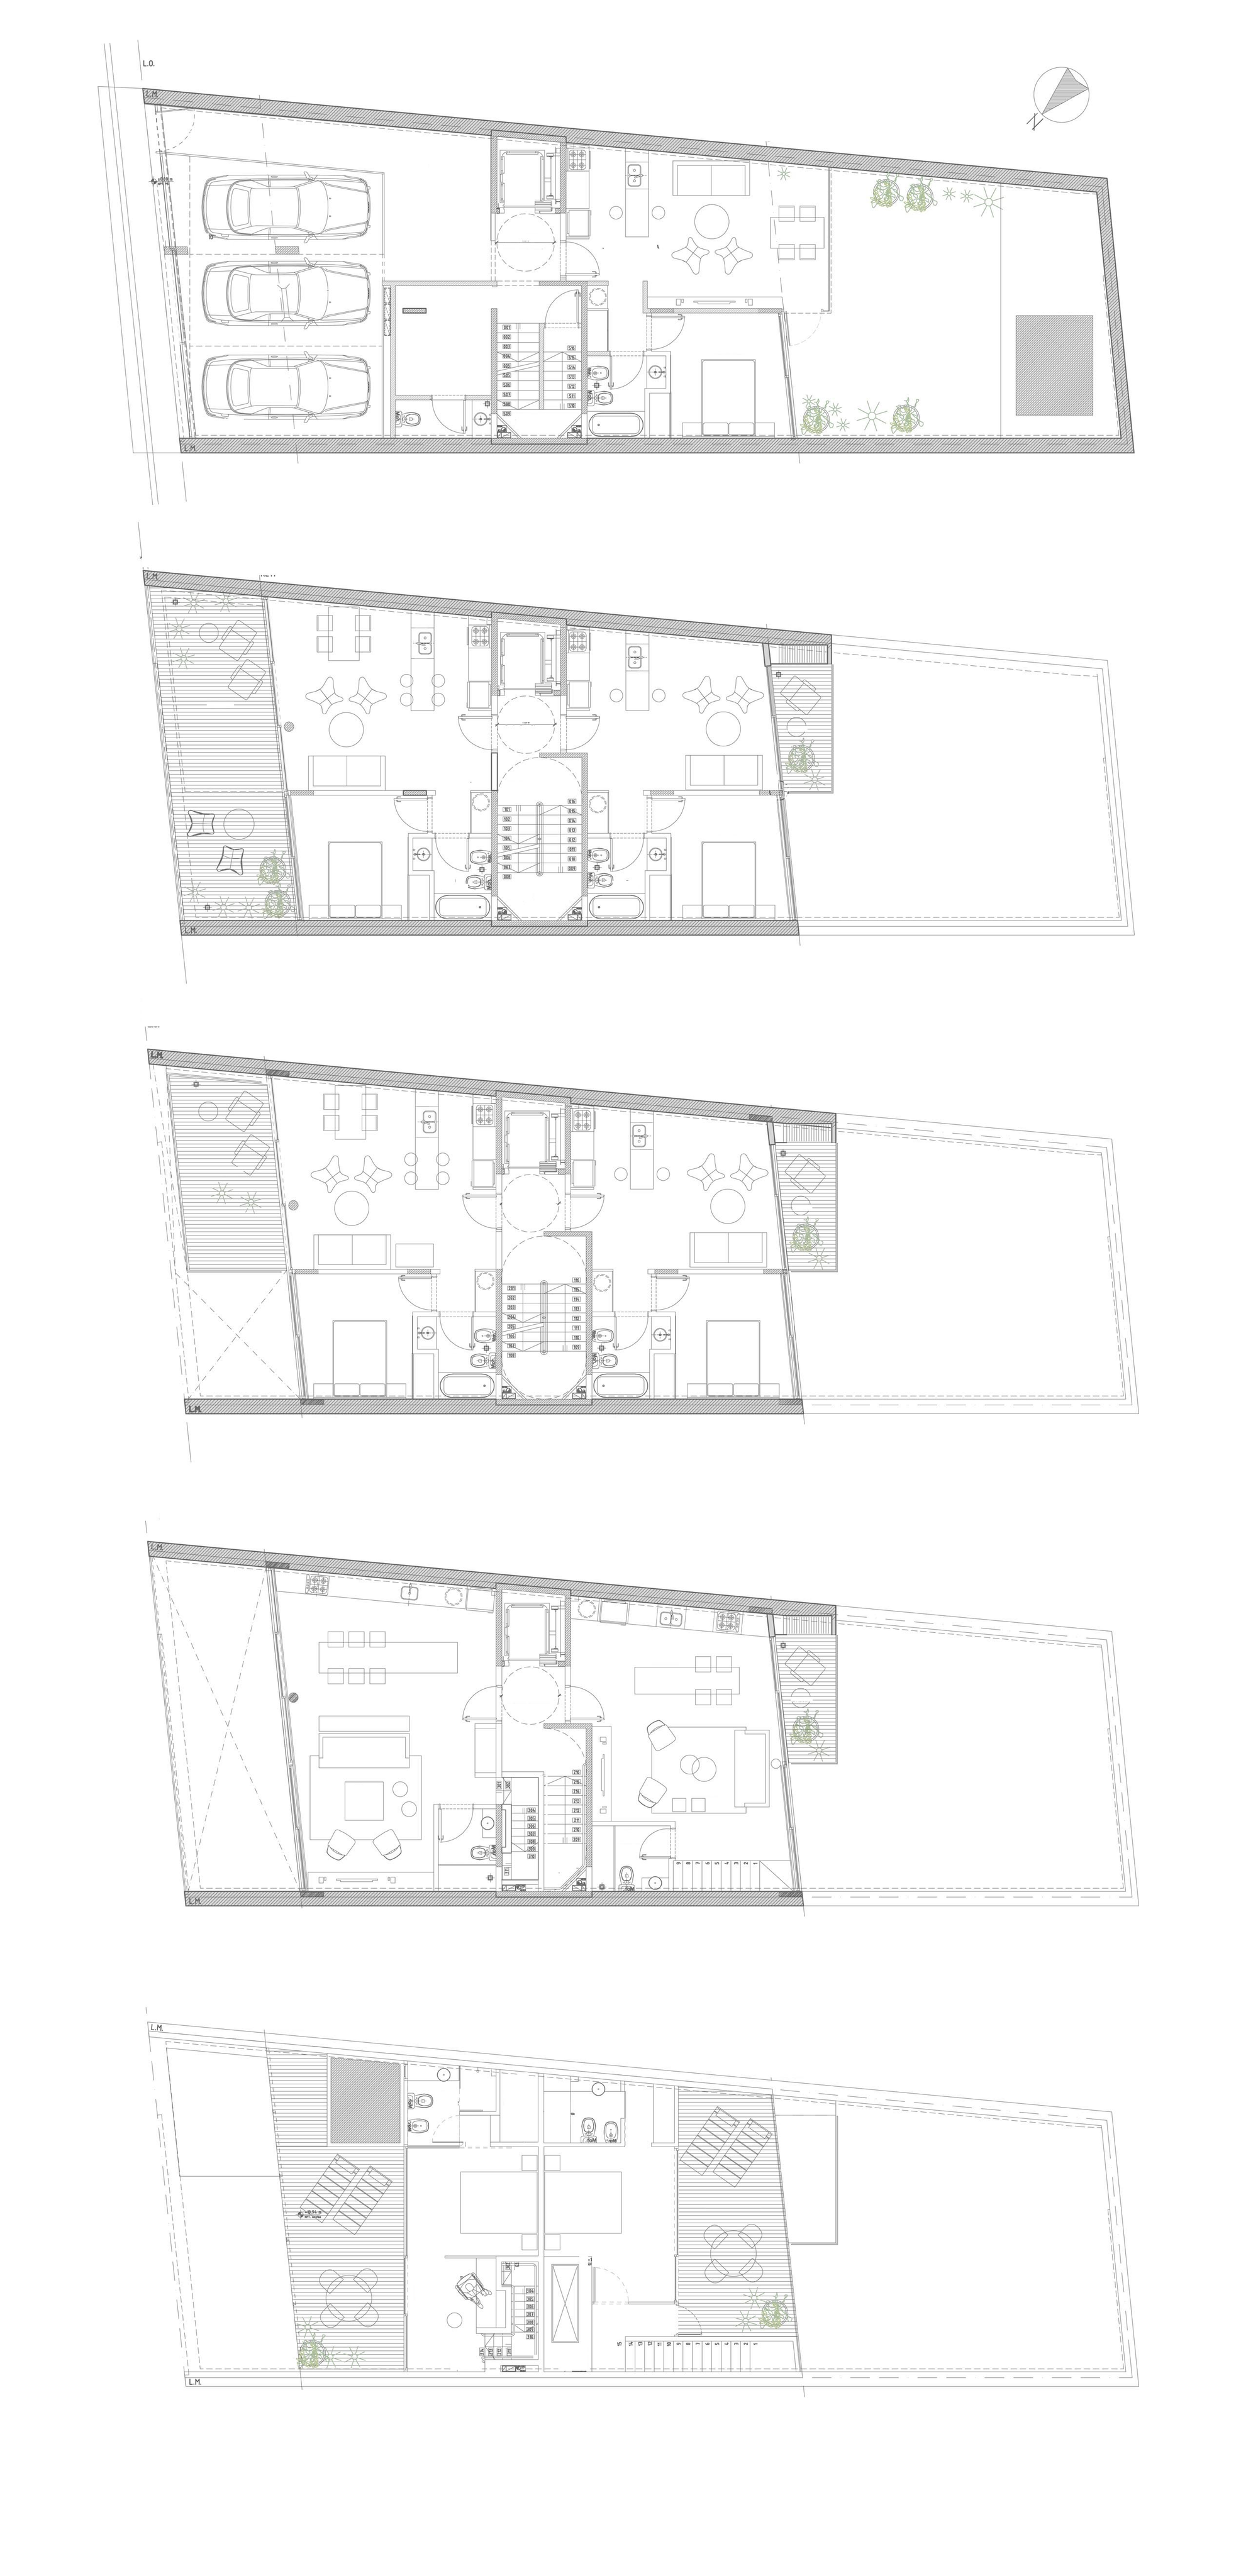 521bba03e8e44e7147000026_edificio-de-viviendas-agrupadas-ana-smud-estudio-rietti-smud_plantas_.png (2000×4097)